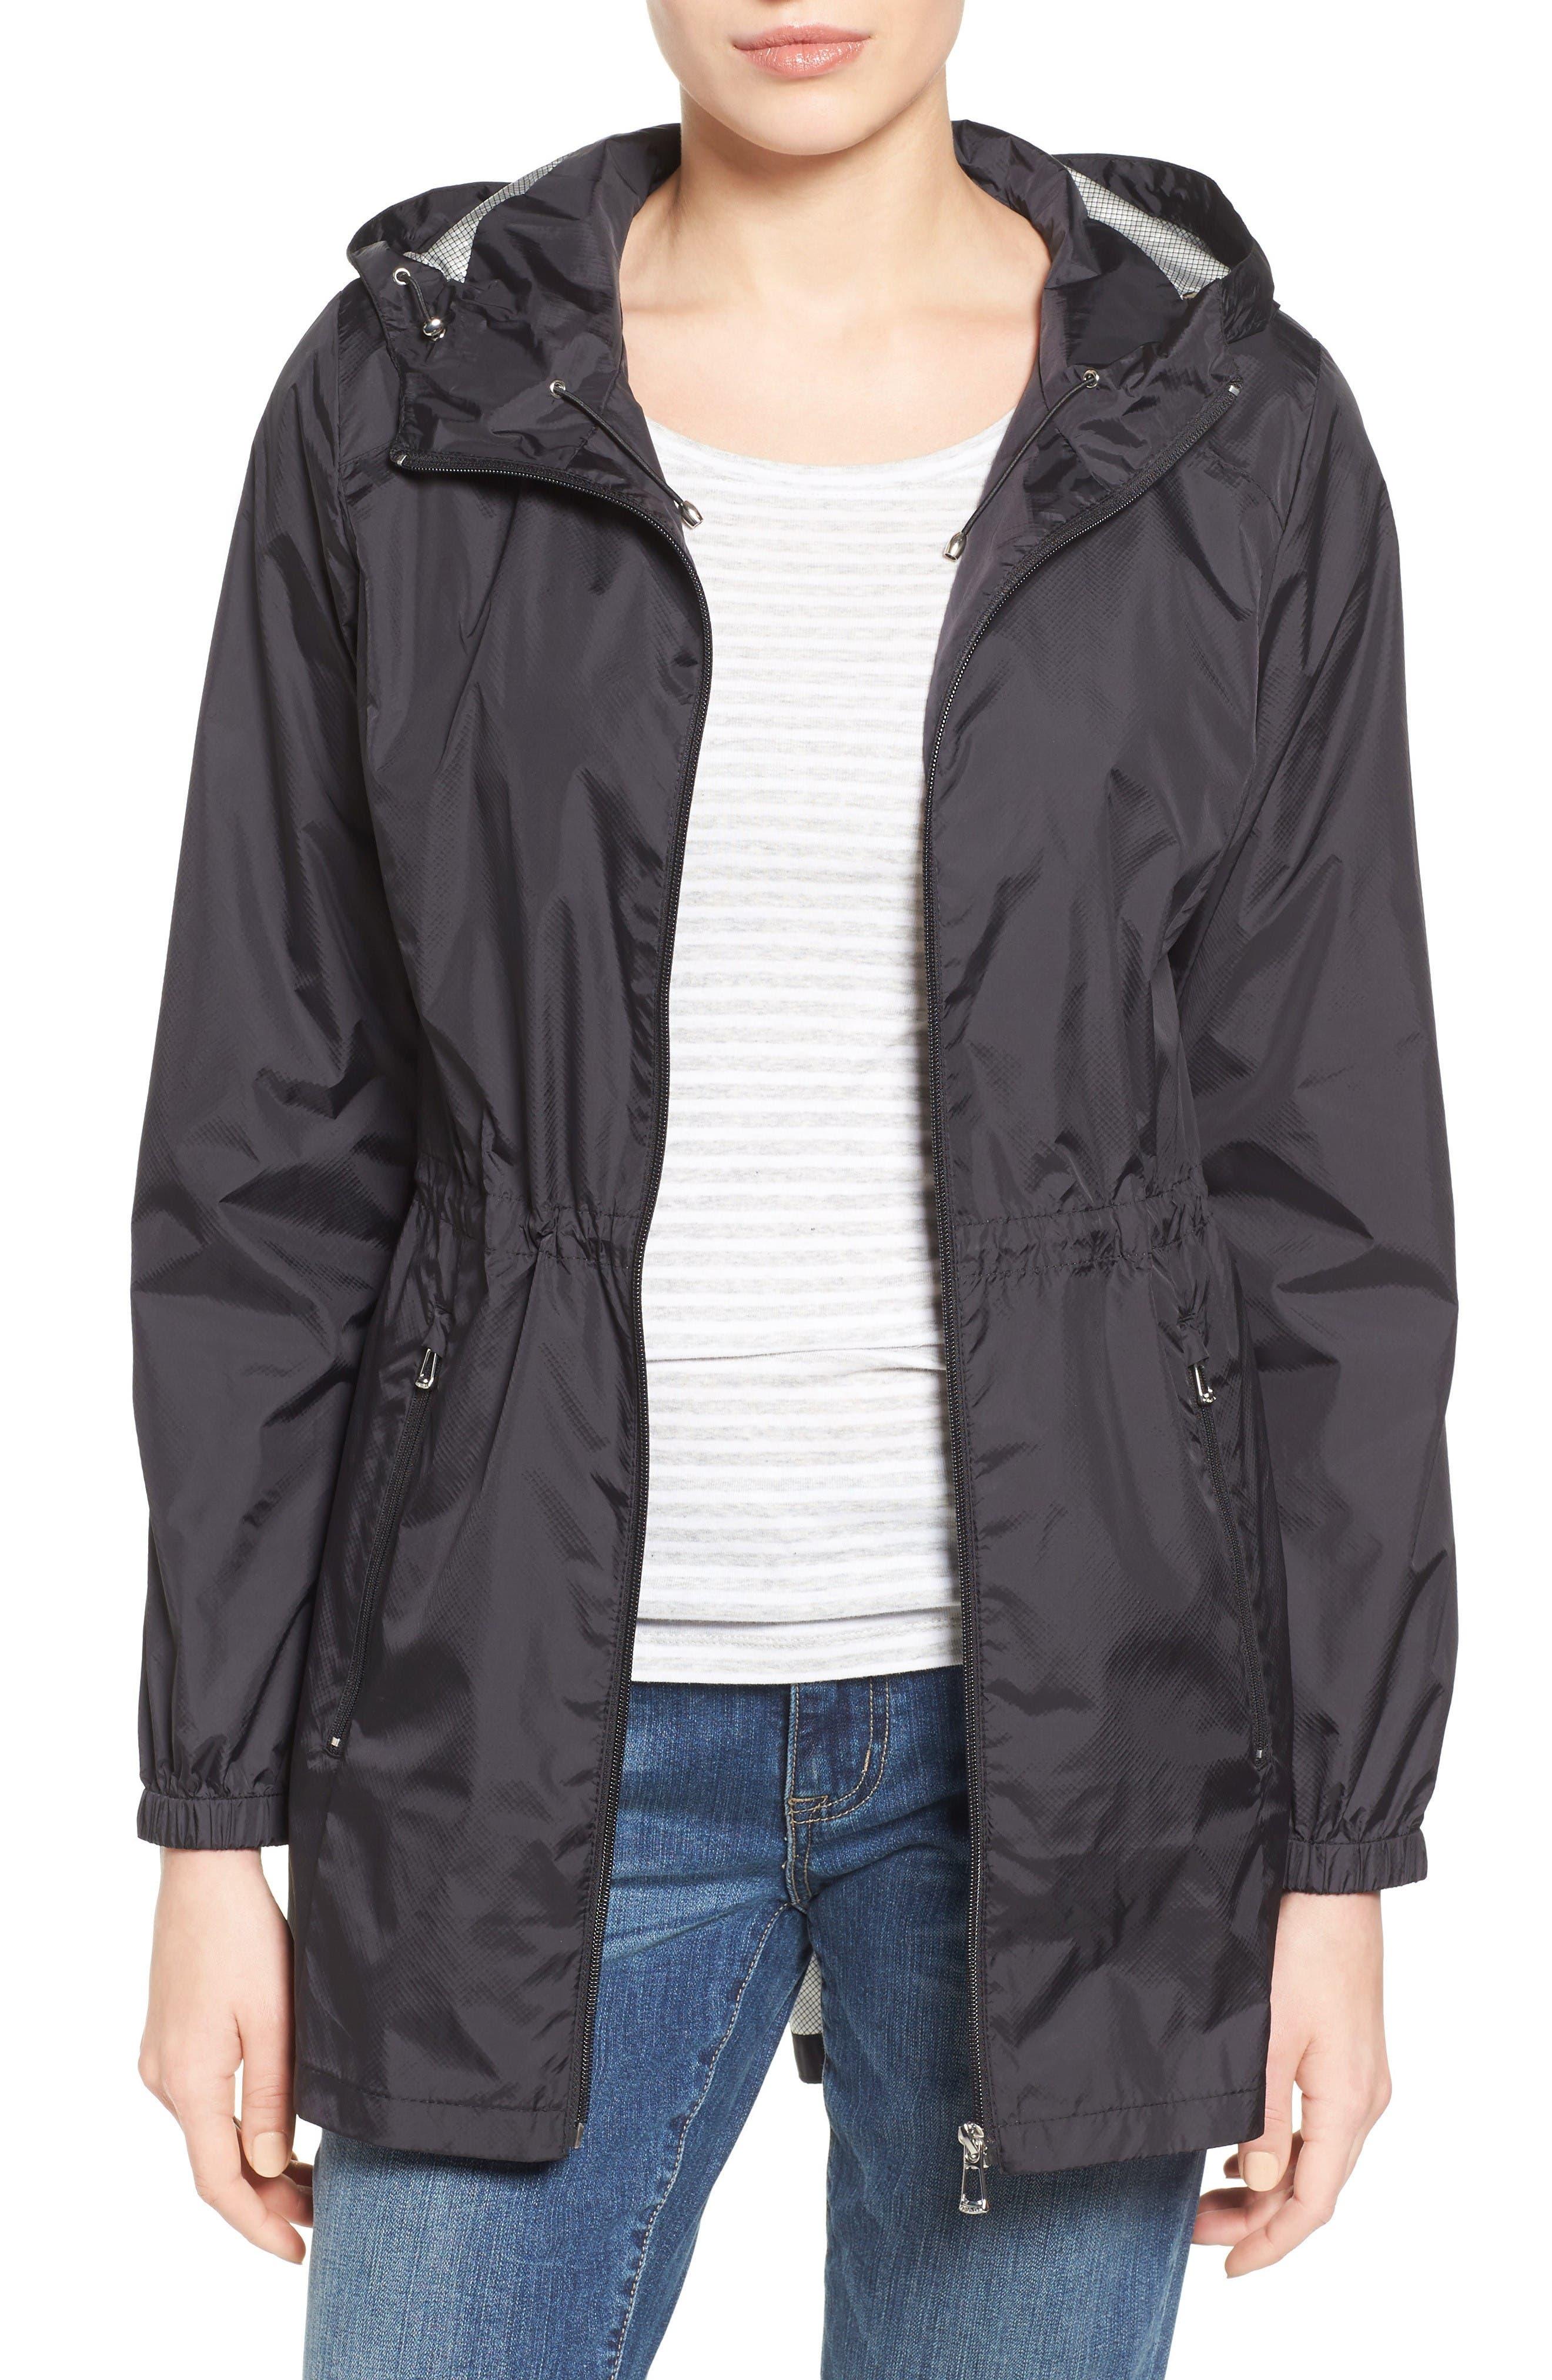 CALVIN KLEIN Packable Rain Jacket